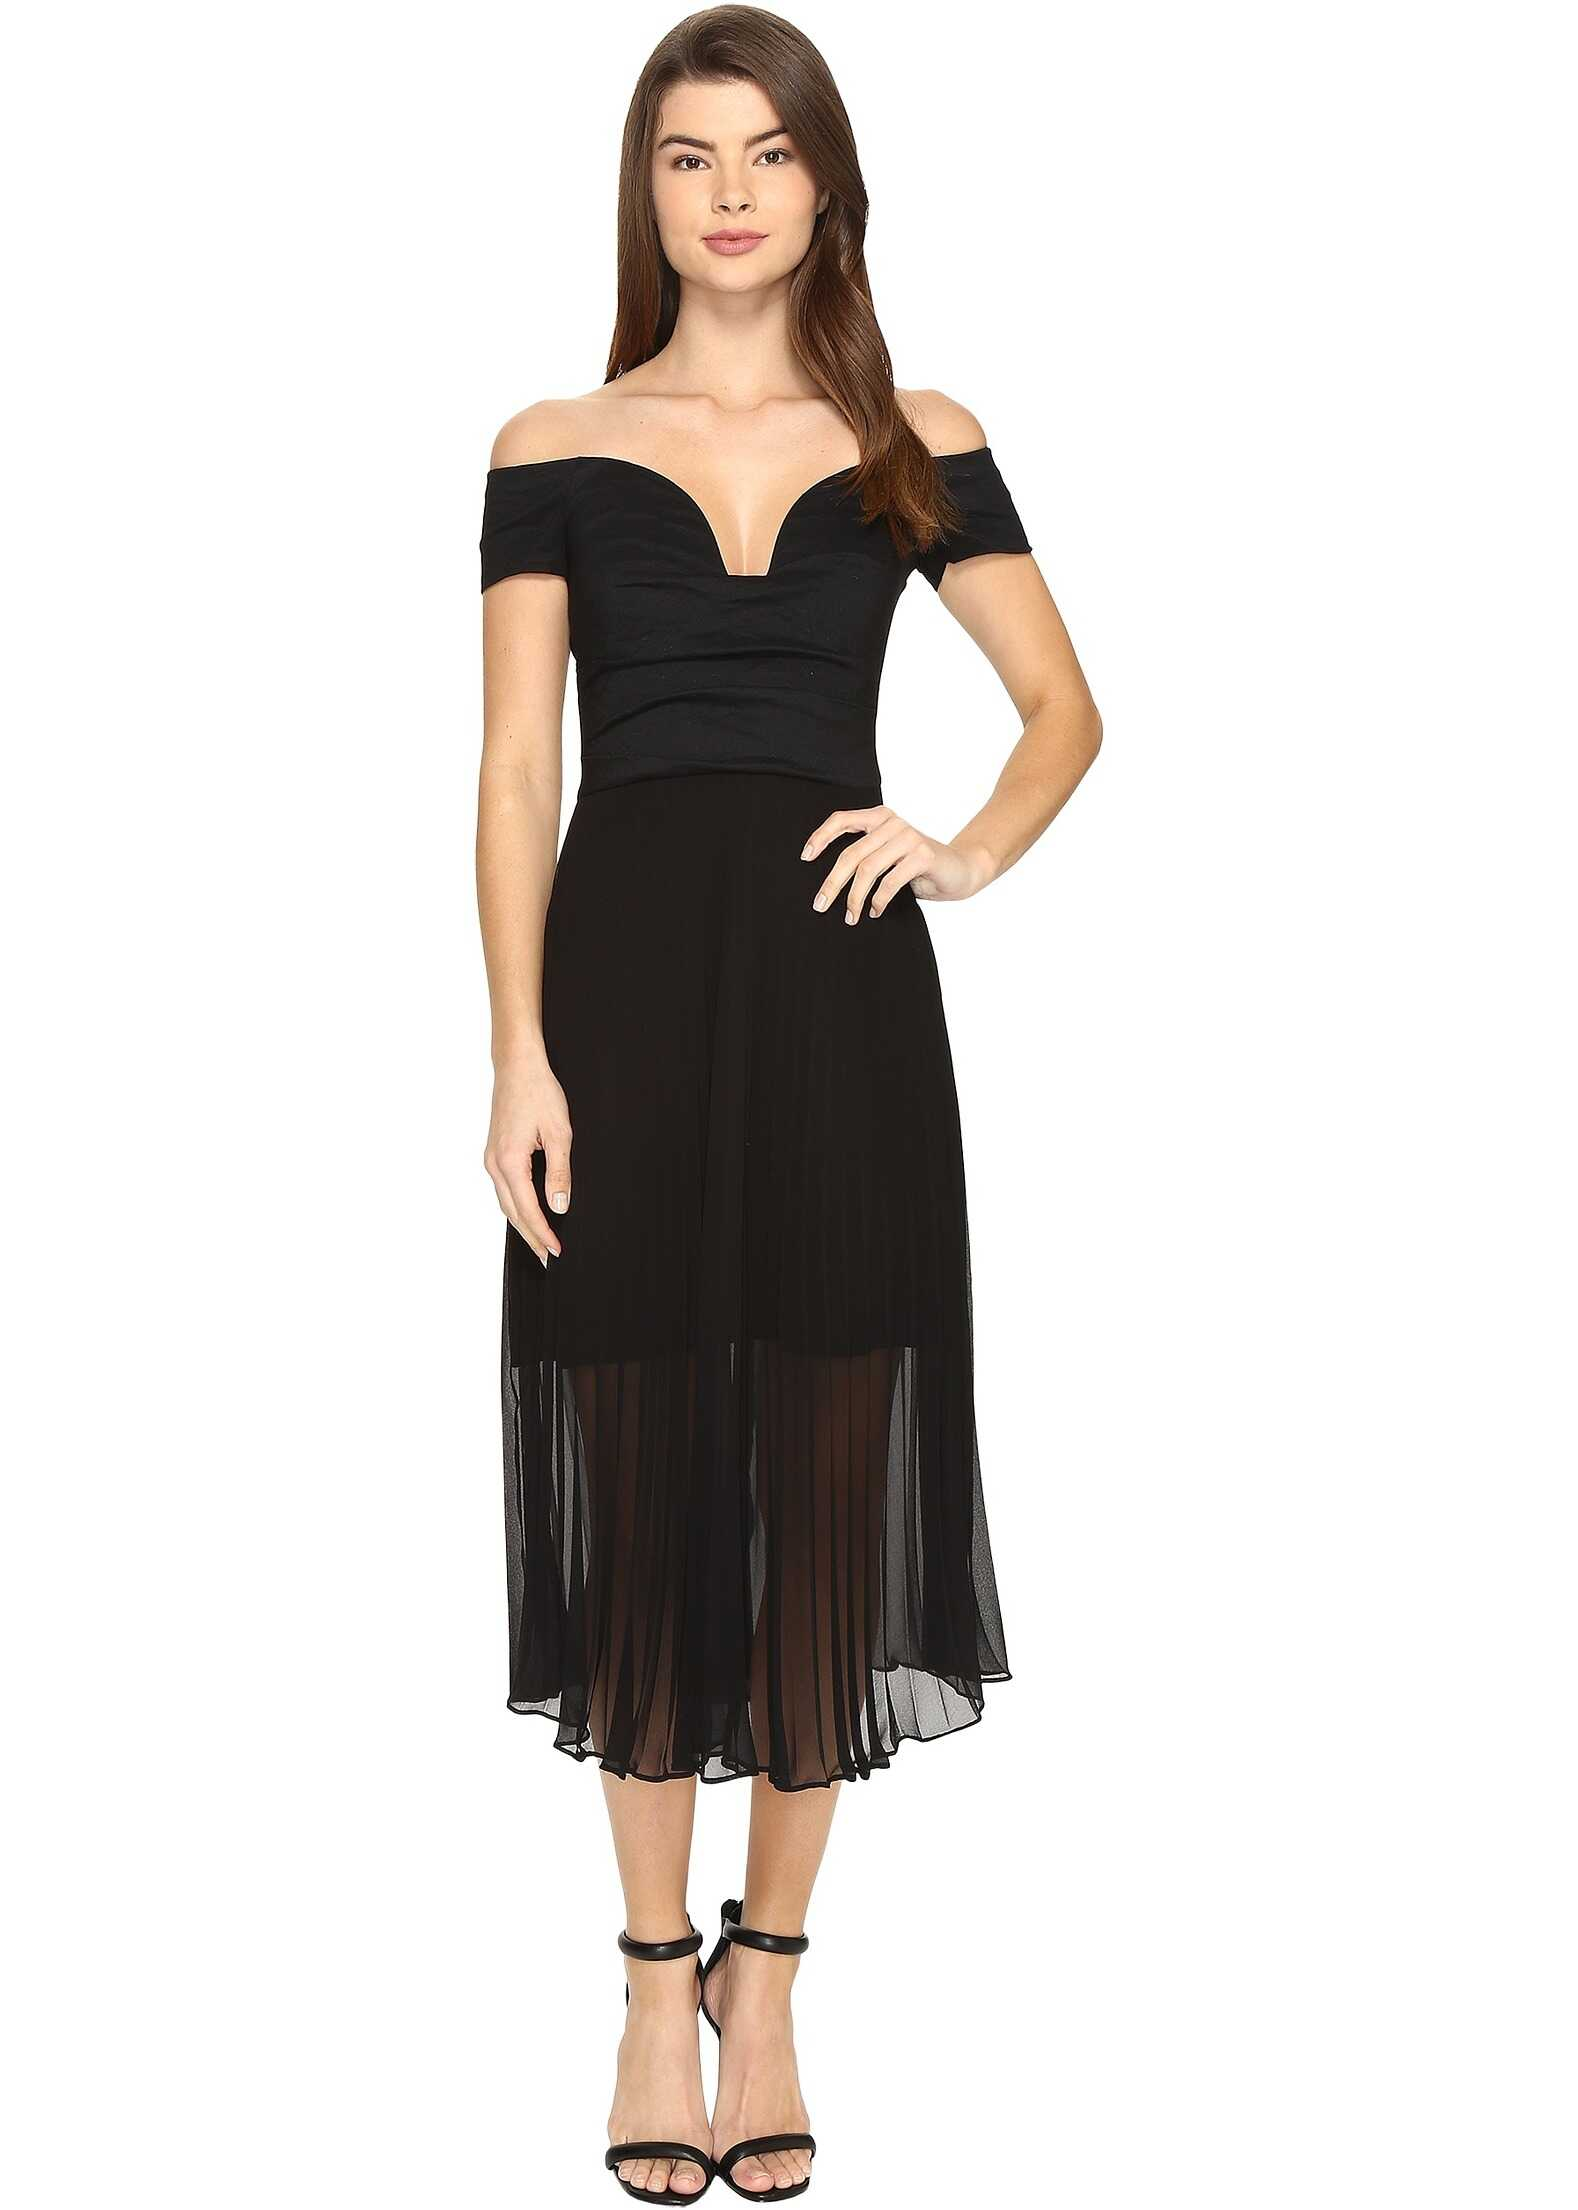 Nicole Miller Solstice Cotton Metal Combo Party Dress Black